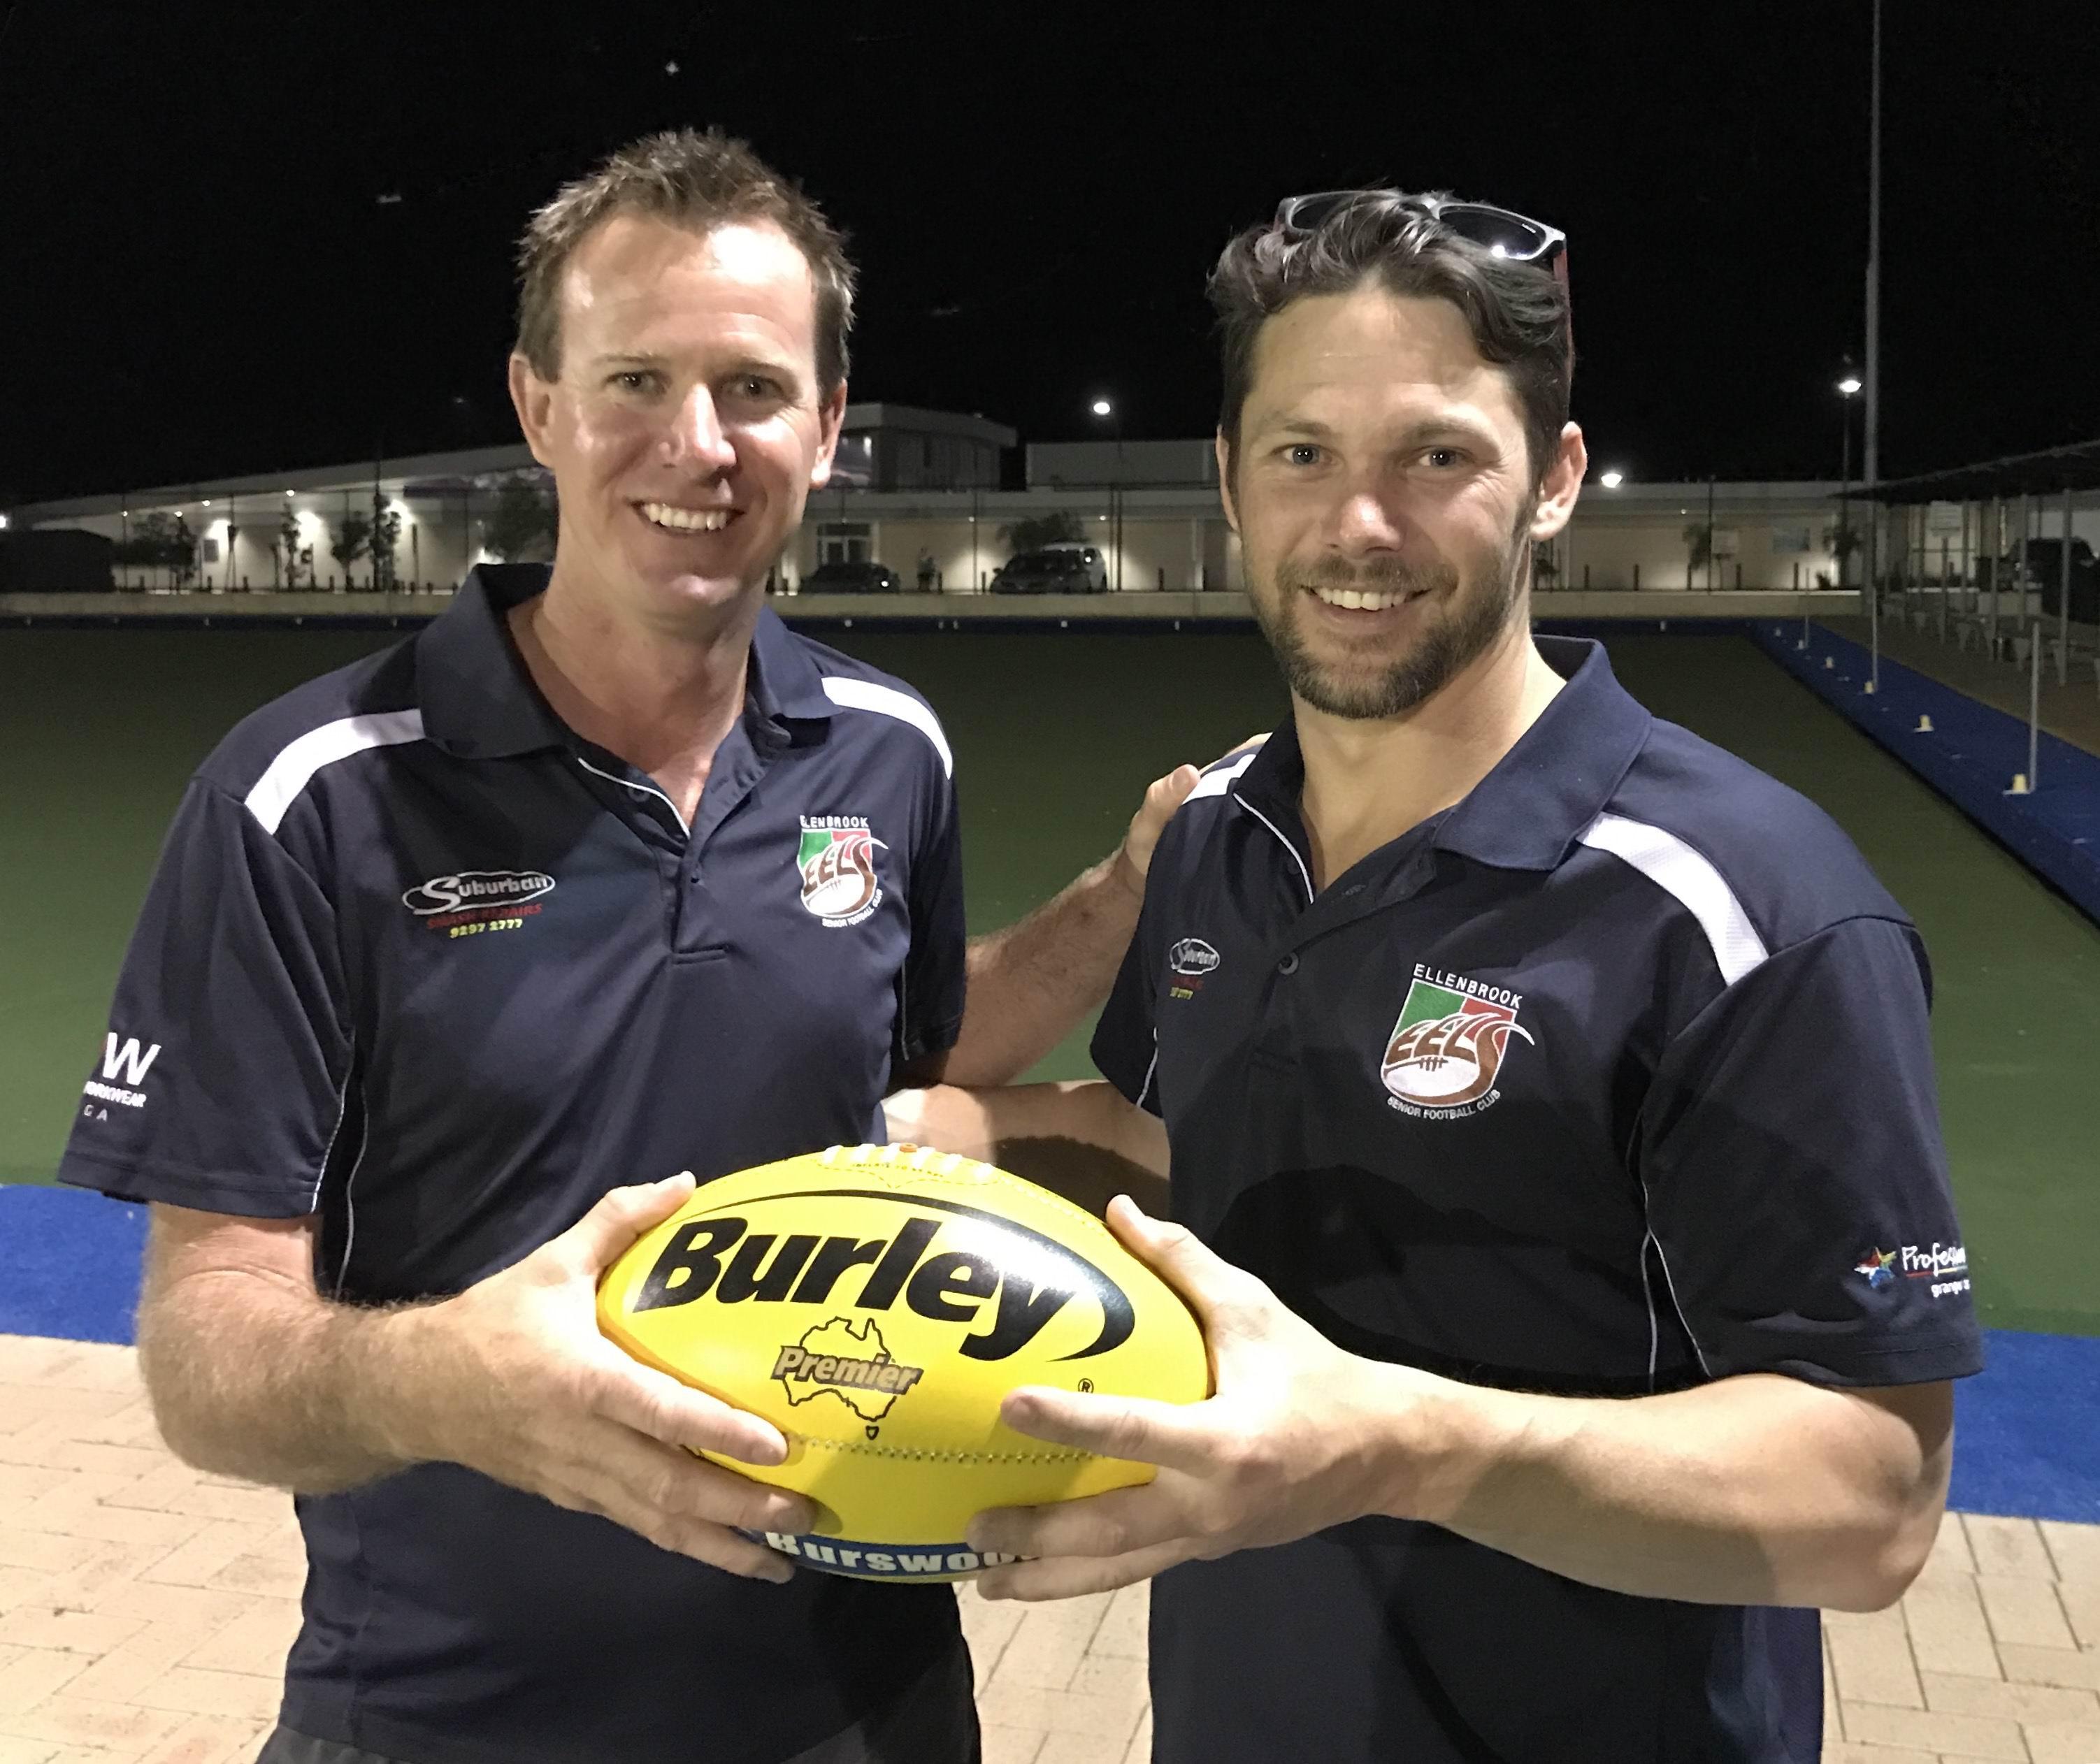 Football: Ellenbrook Eels appoint former Geelong player Justin Wood as coach